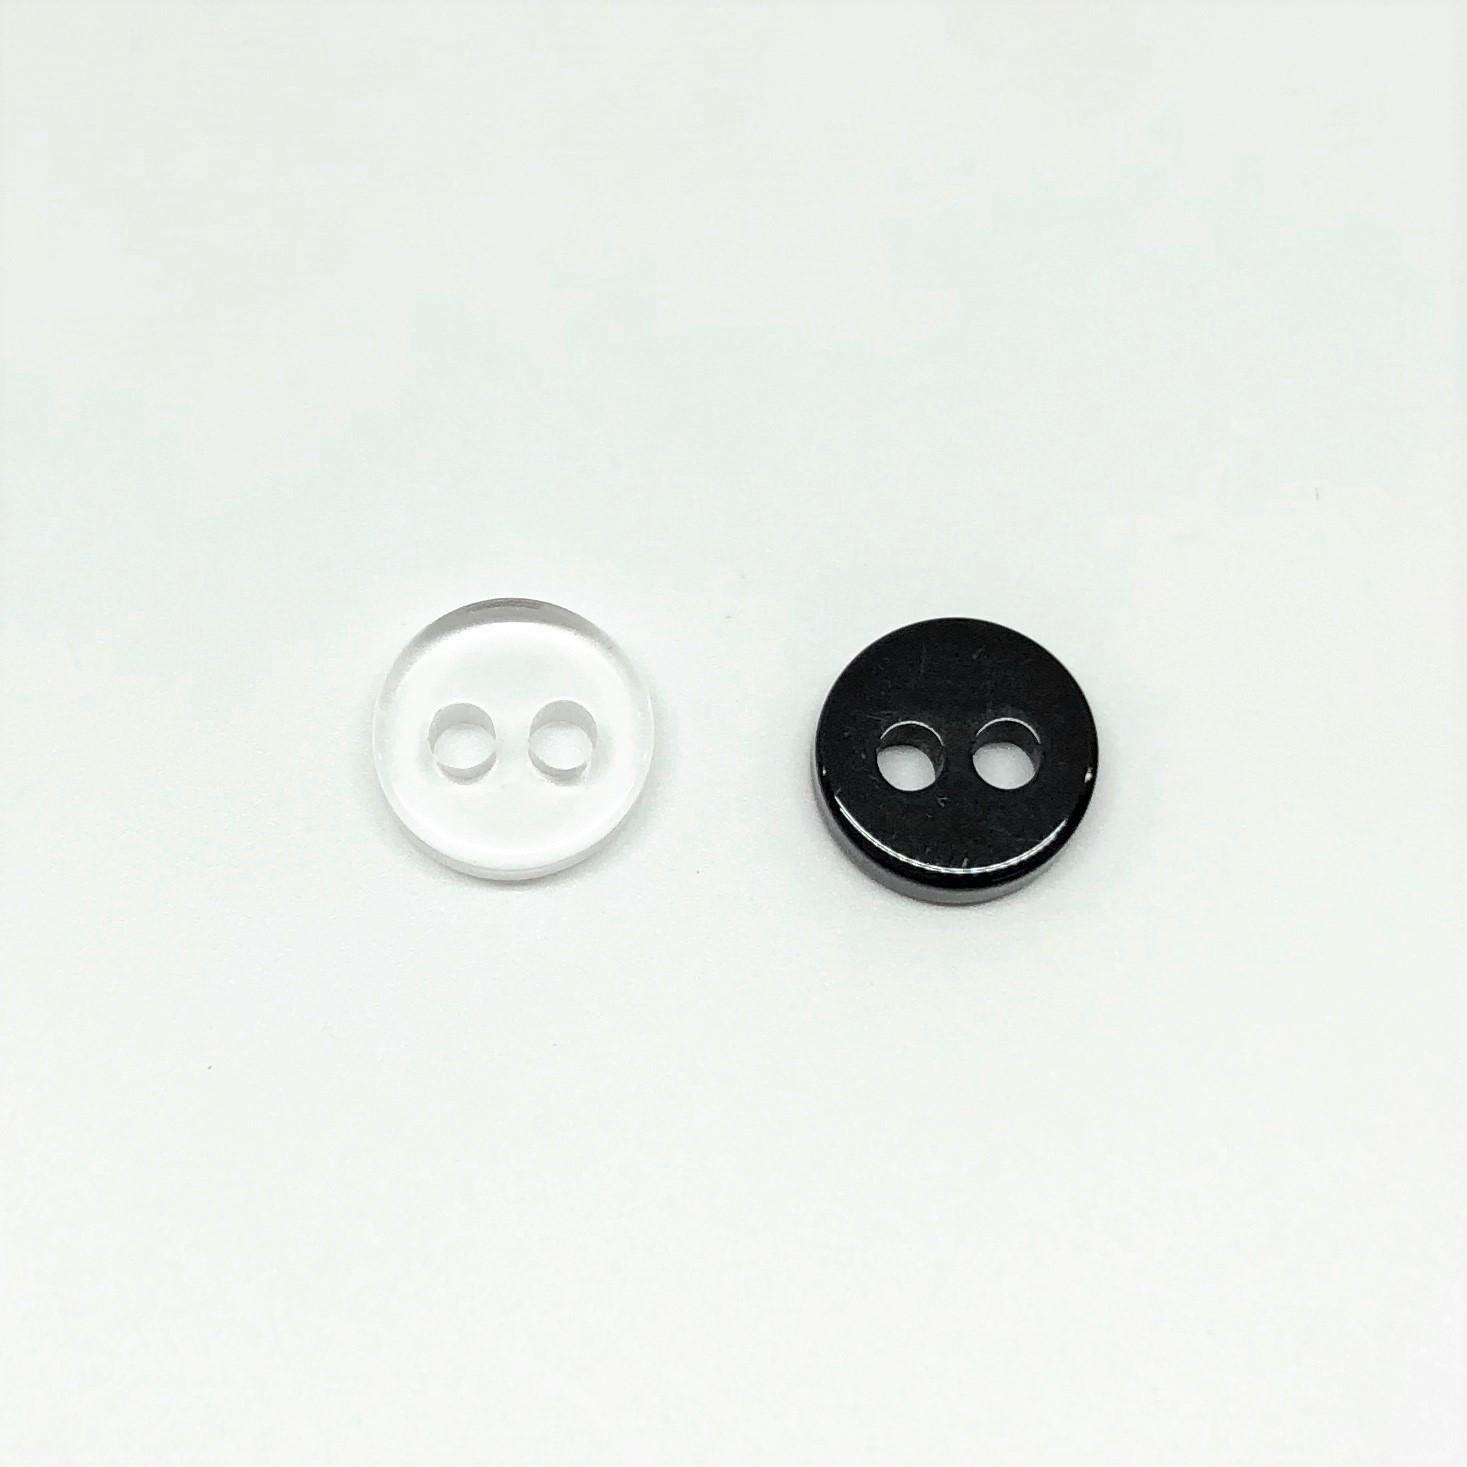 2H-P 2つ穴力ボタン 大阪プラスチック工業(DAIYA BUTTON)/オークラ商事 - ApparelX アパレル資材卸通販